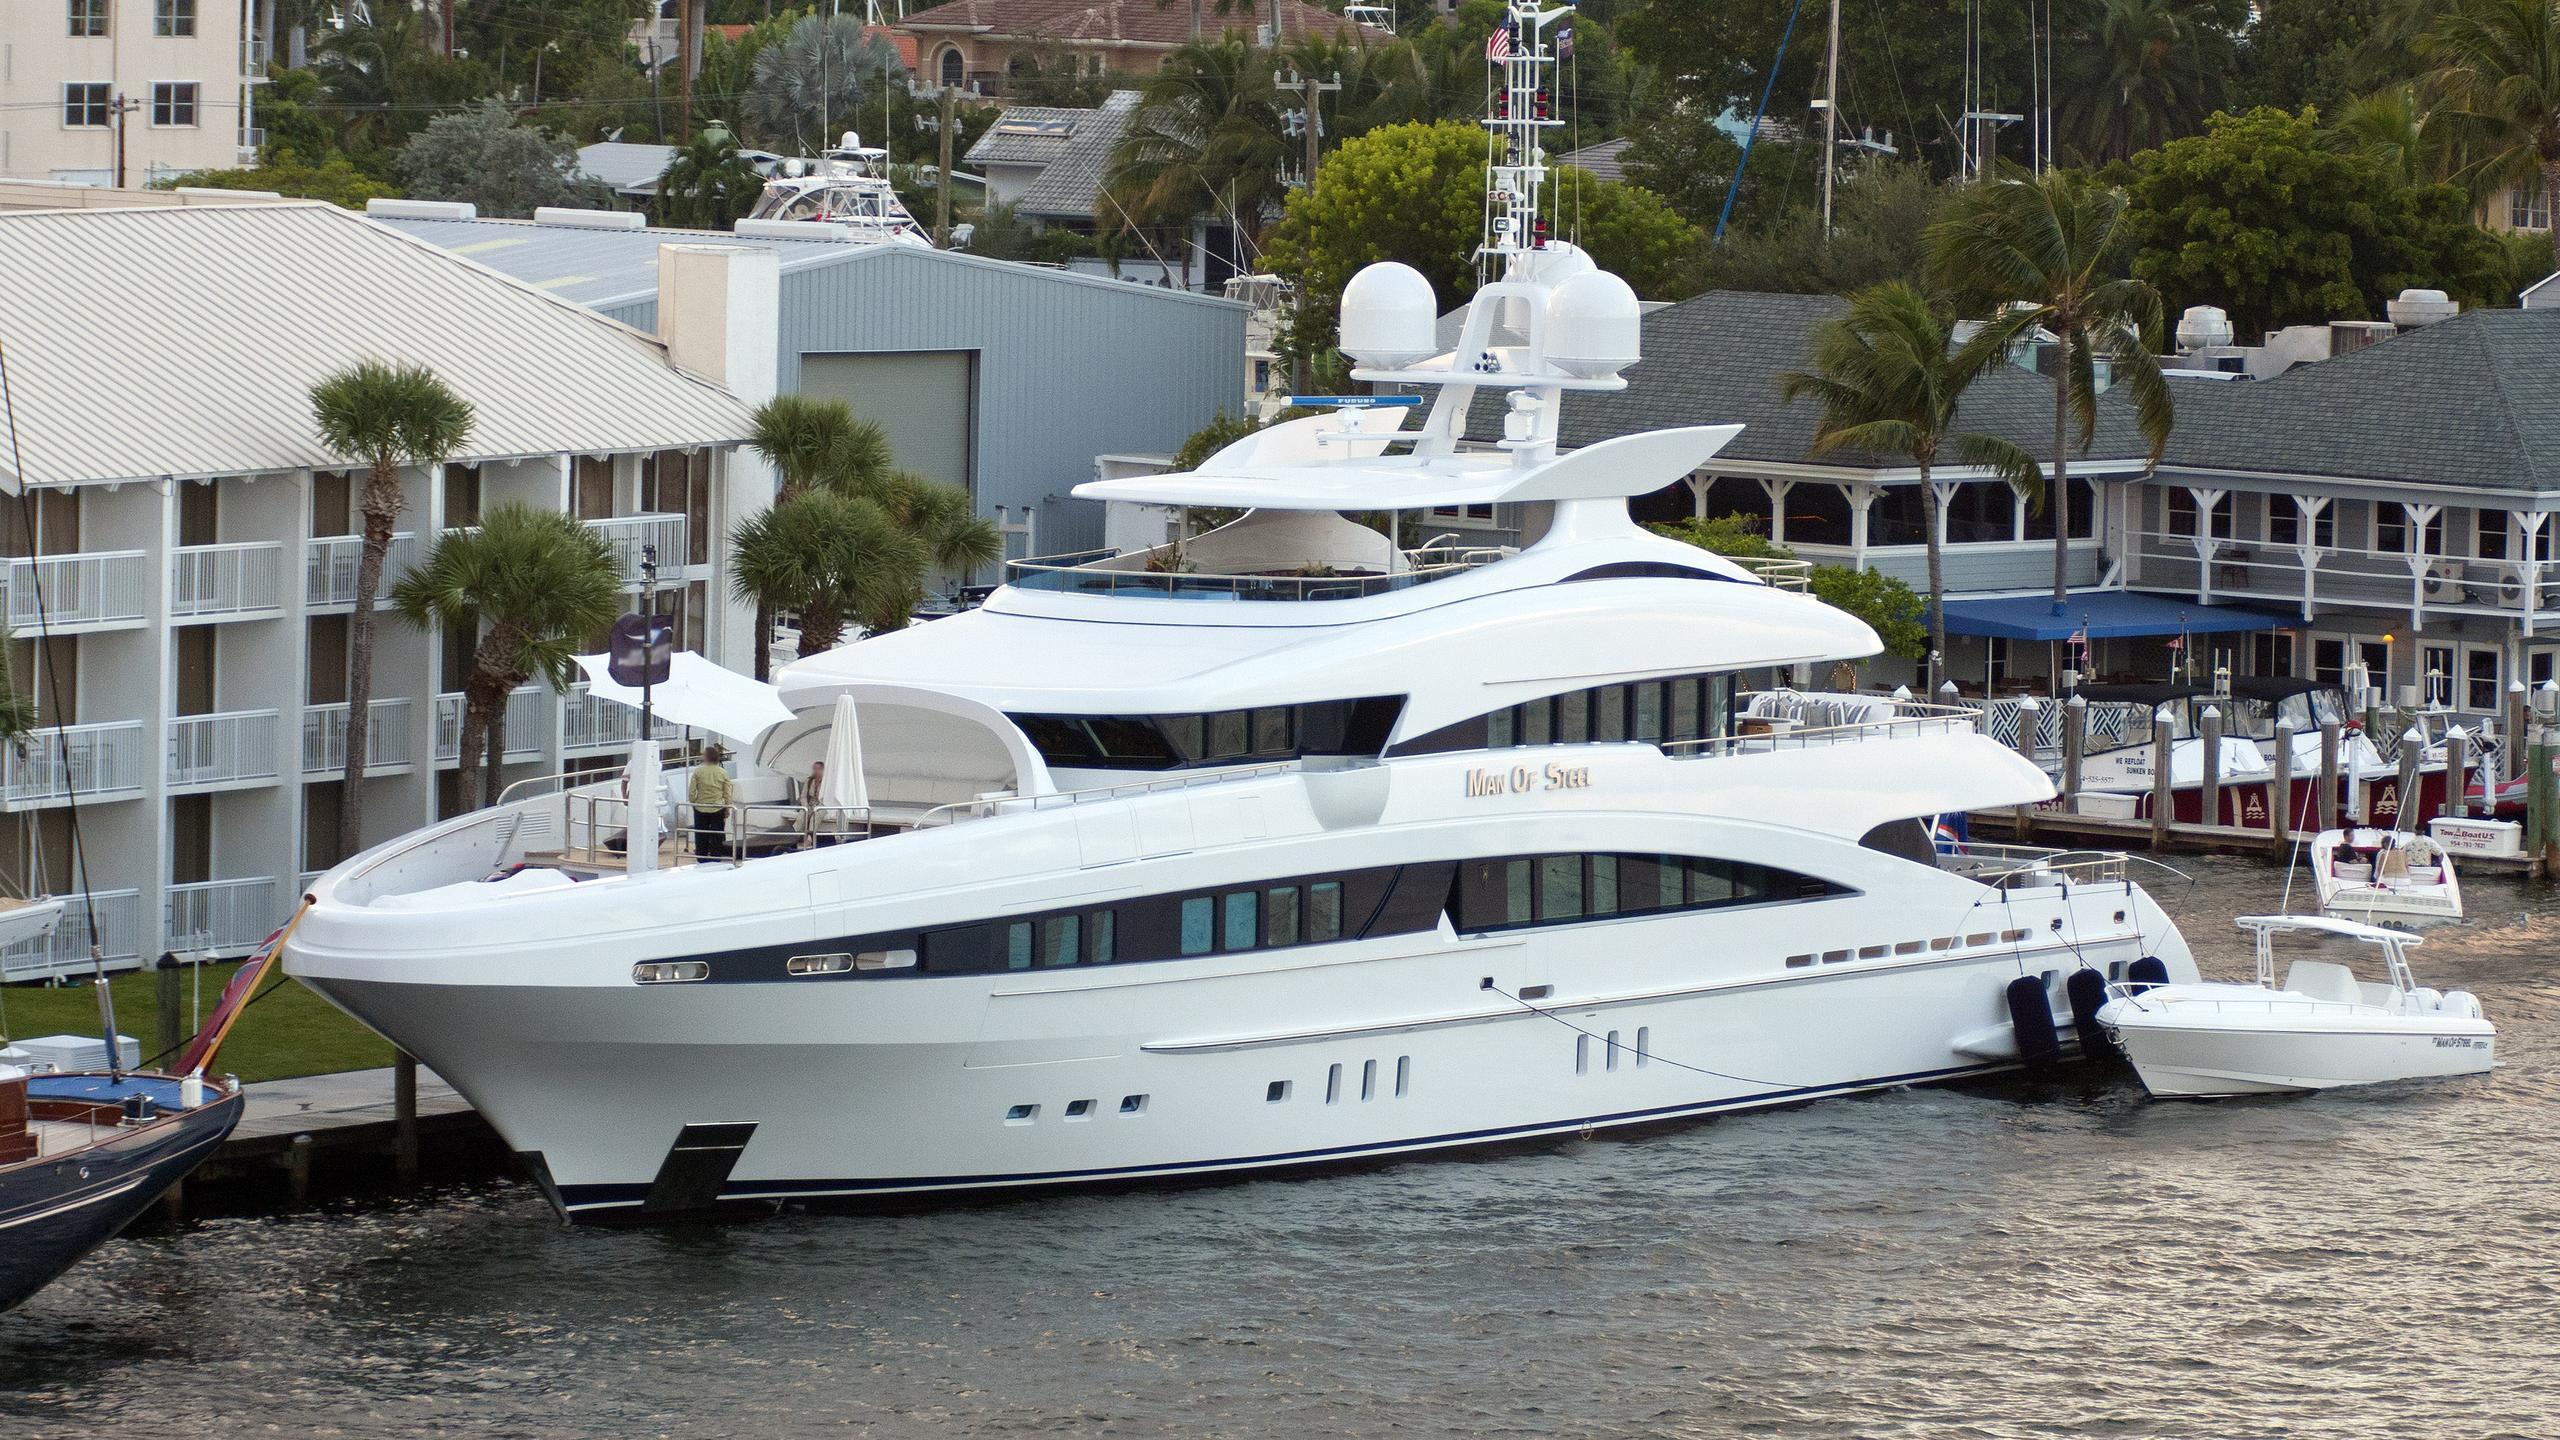 inception-motor-yacht-heesen-5000-2008-50m-berth